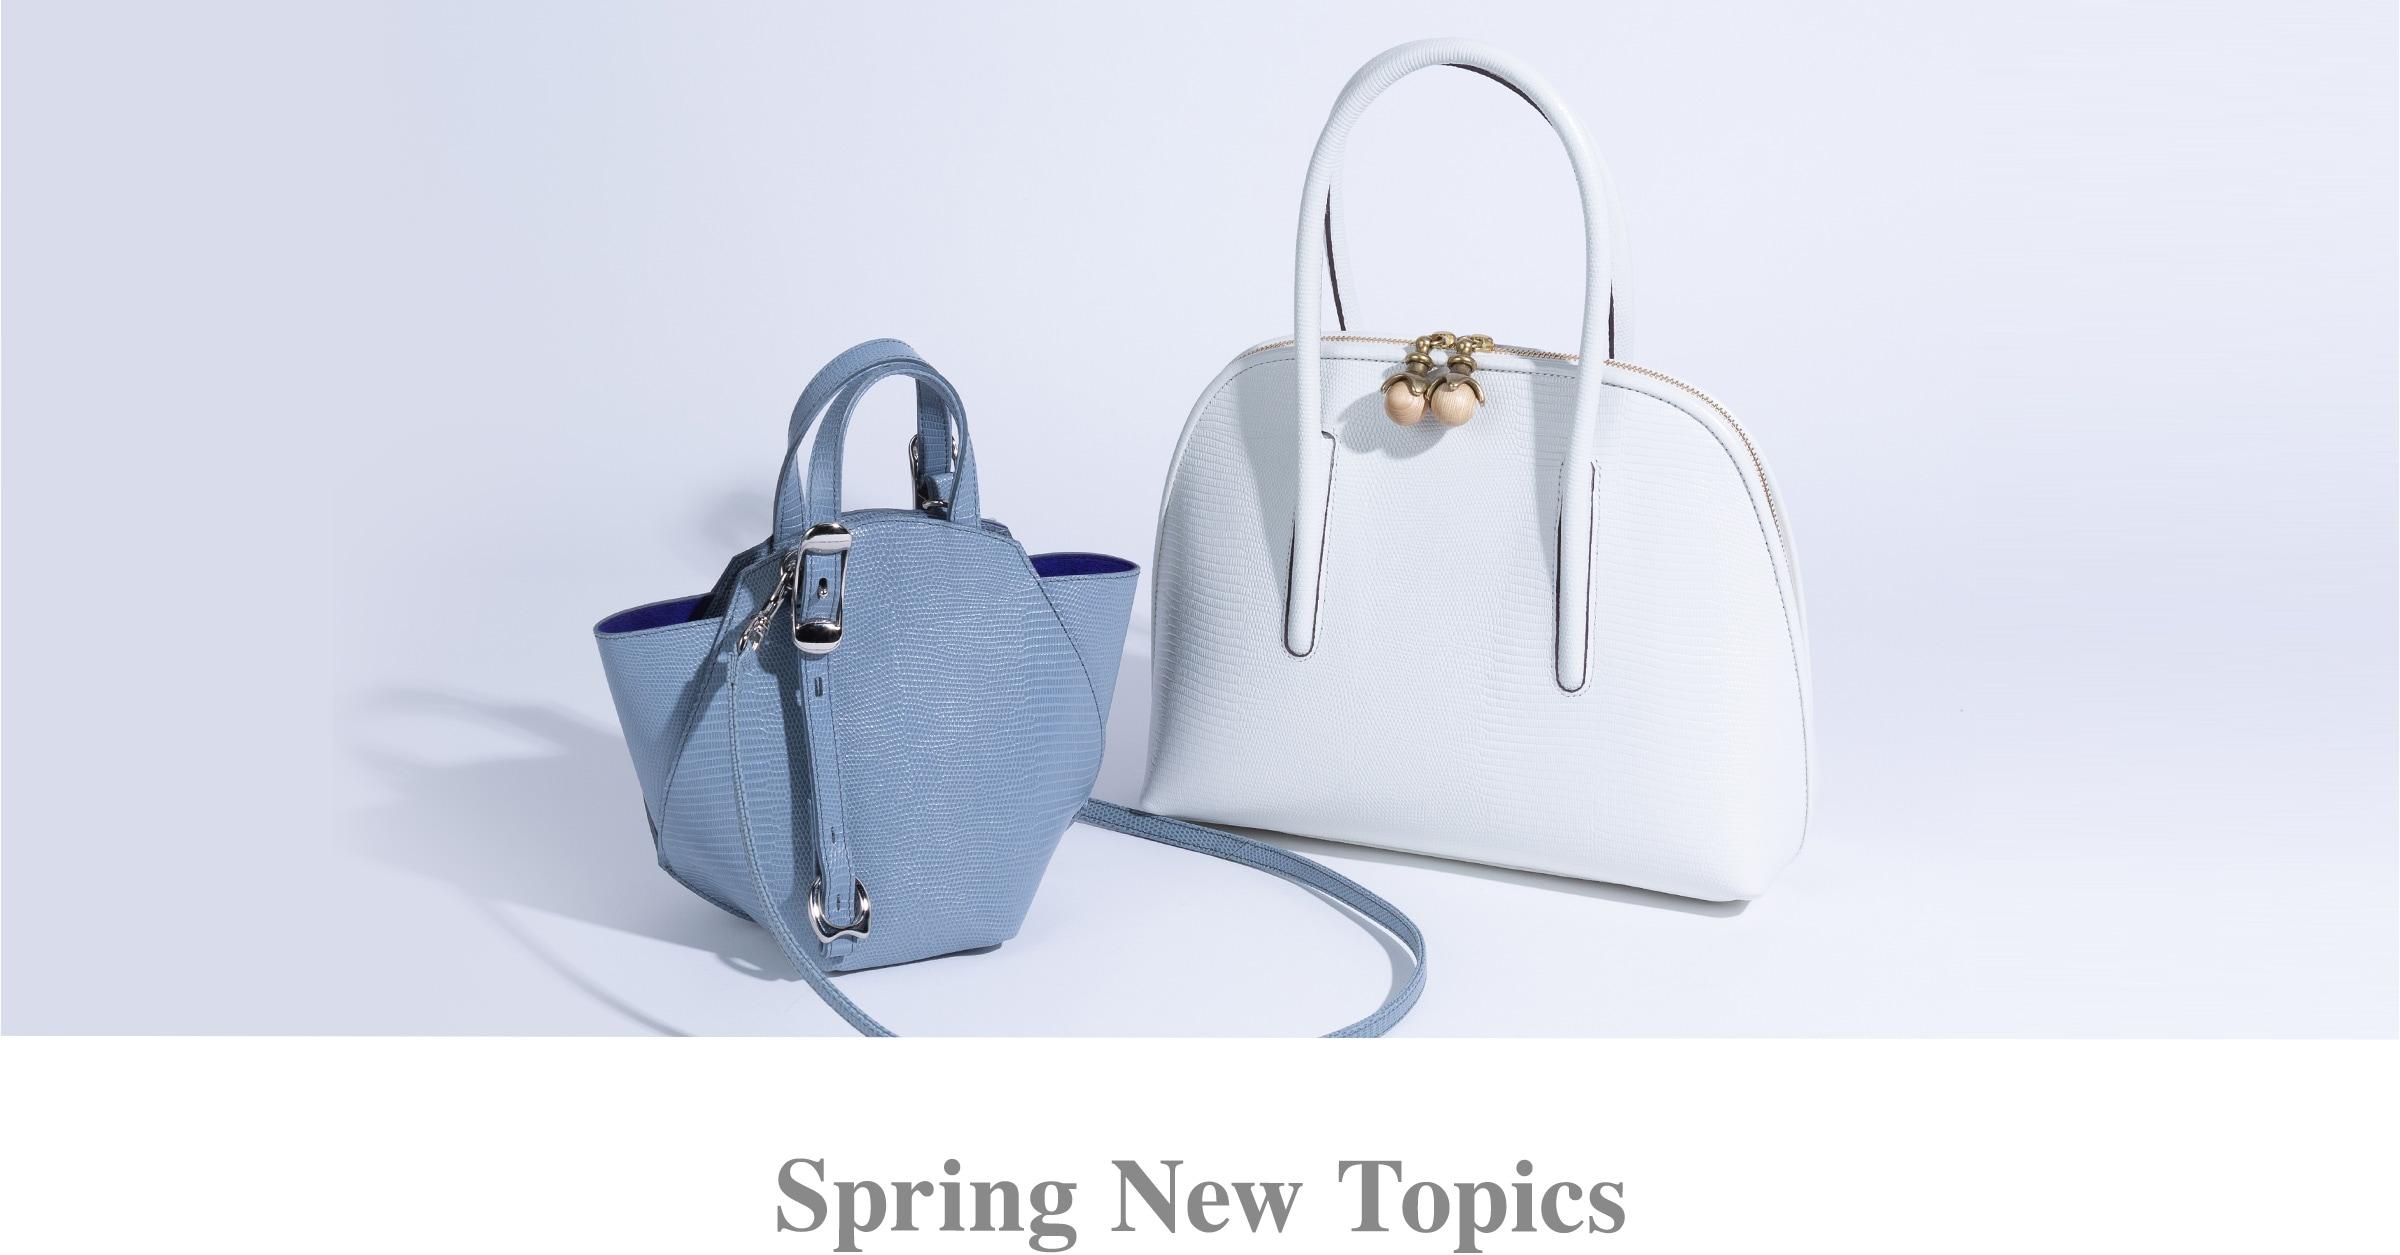 Spring New Topics